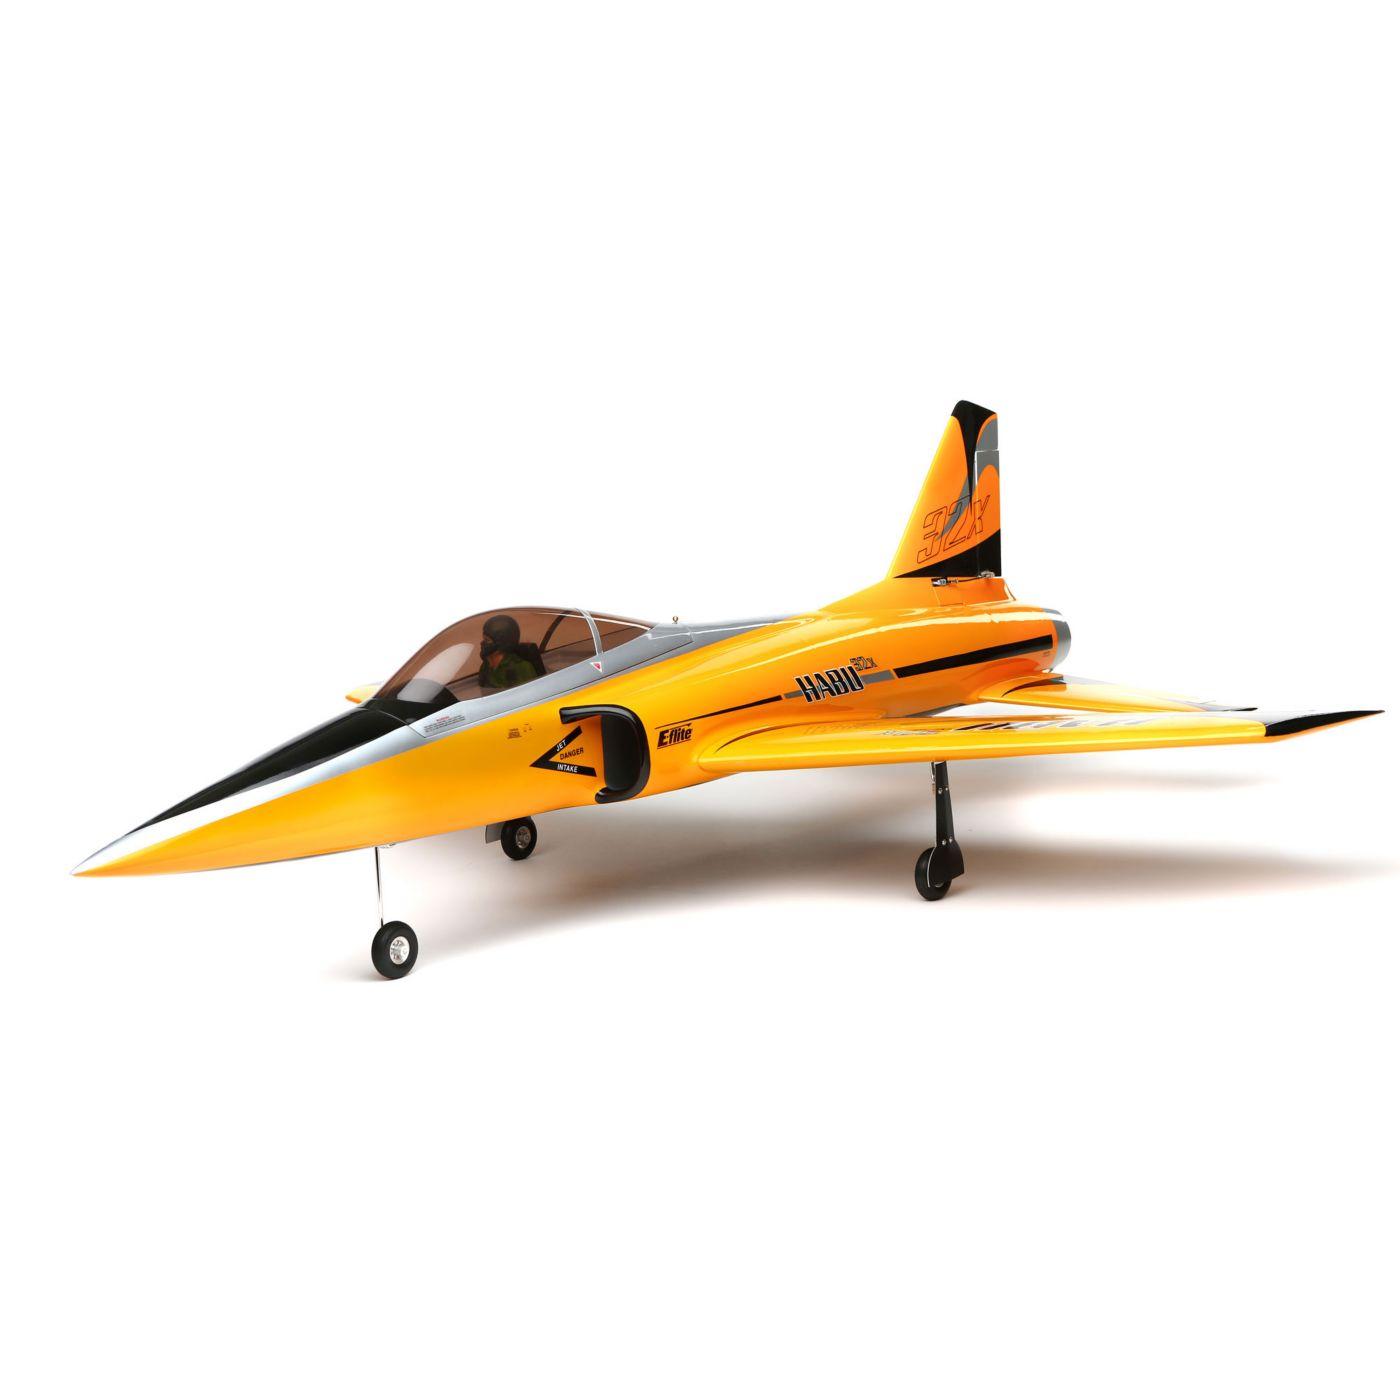 E-flite Habu 32x ARF Ducted Fan RC Sport Jet | Horizon Hobby